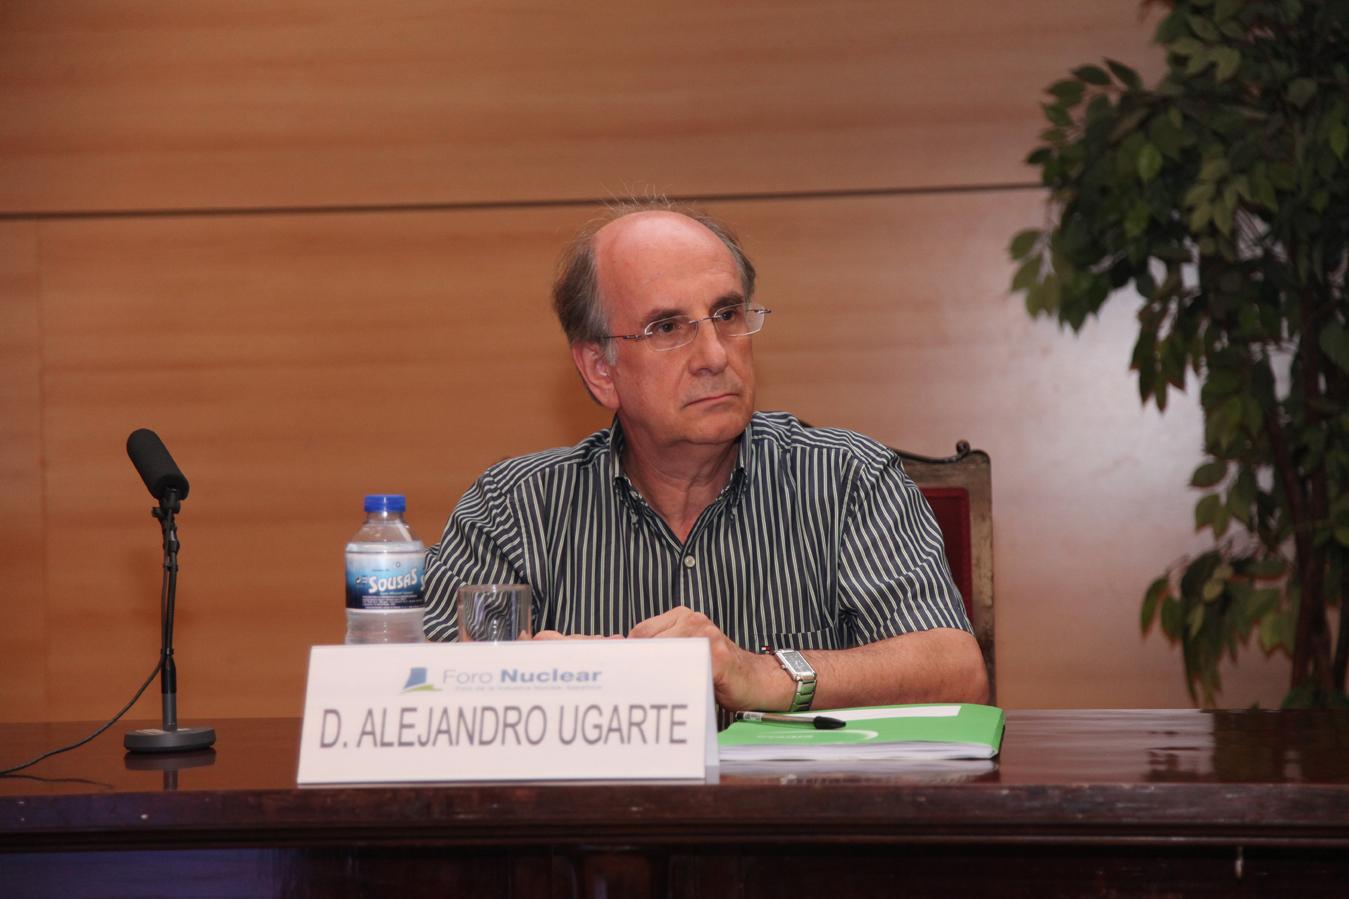 Alejandro Ugarte Pallarés